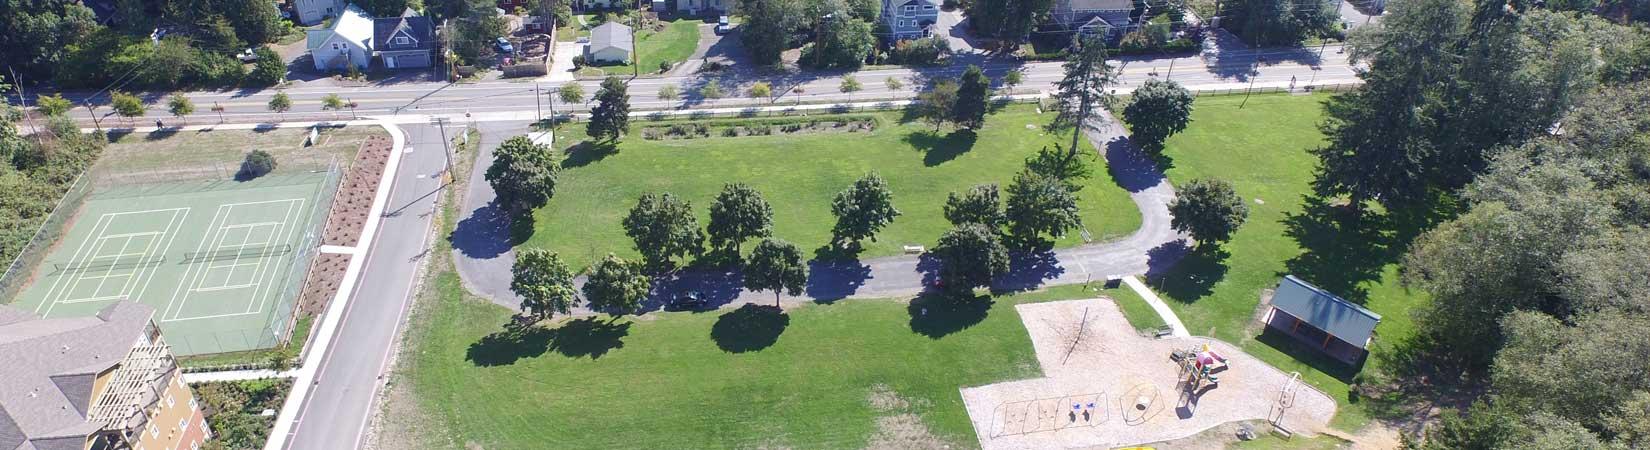 Village Green Park Aerial